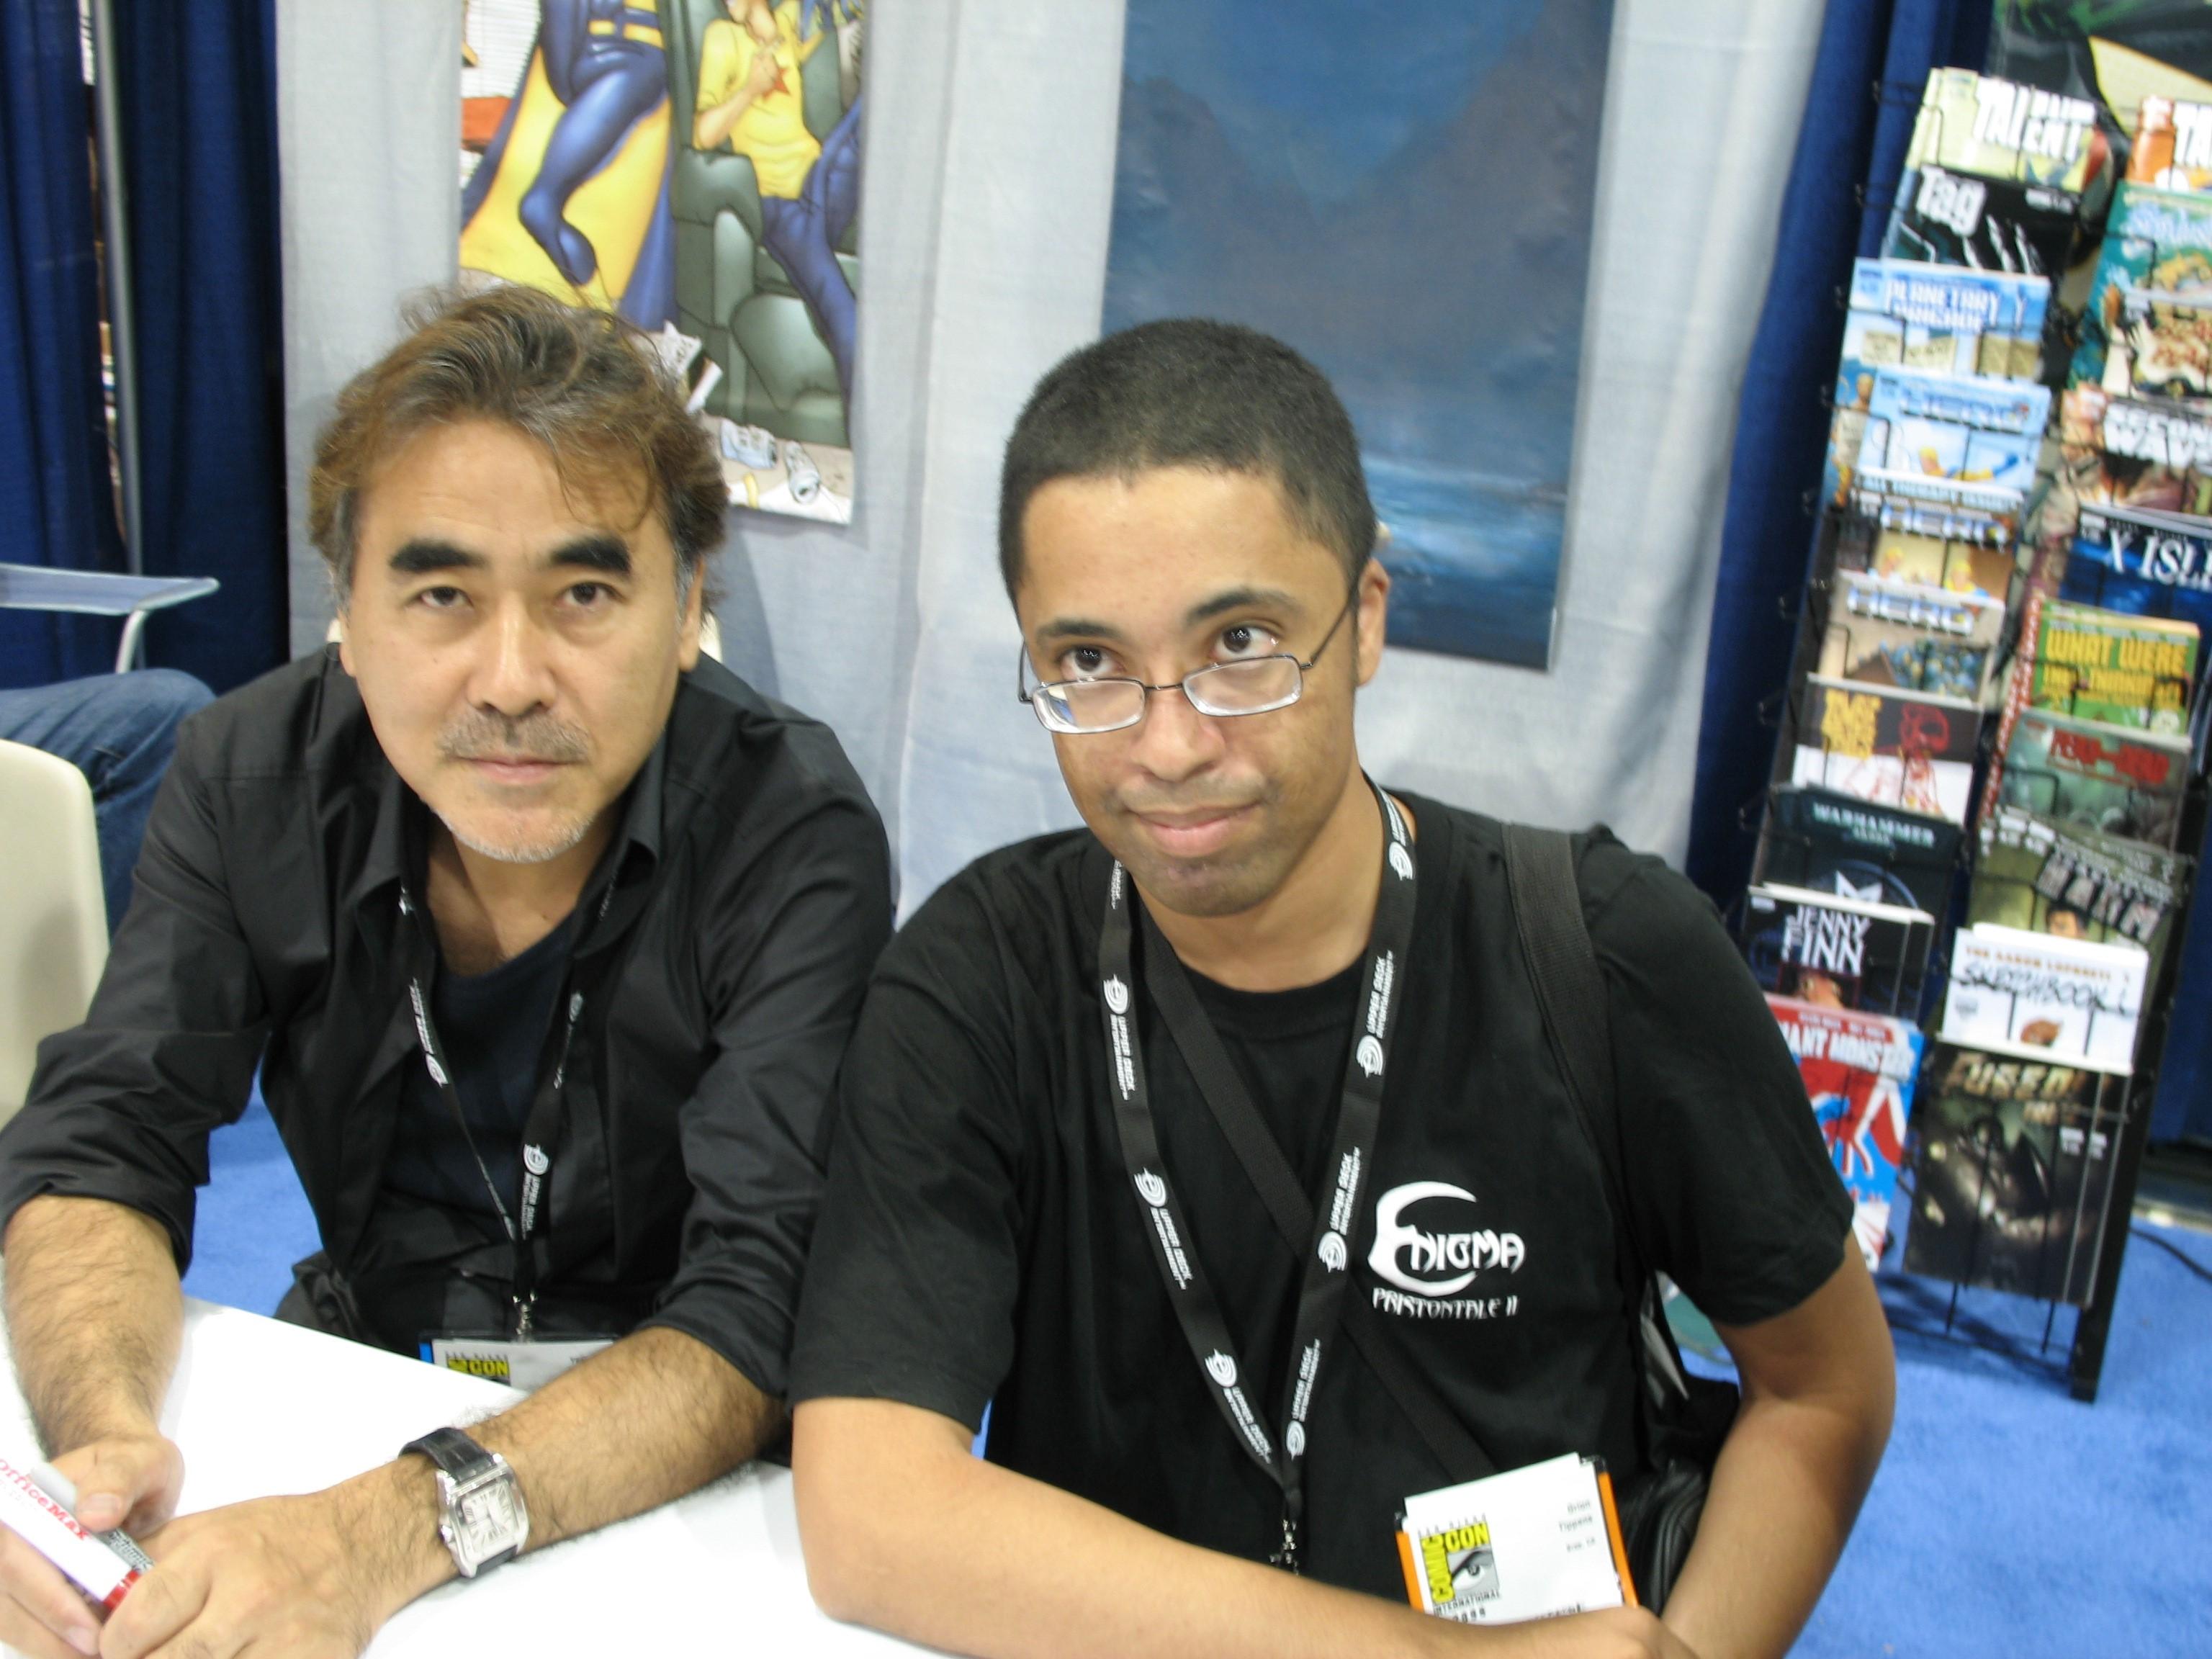 Yoshitaka Amano (left) andme